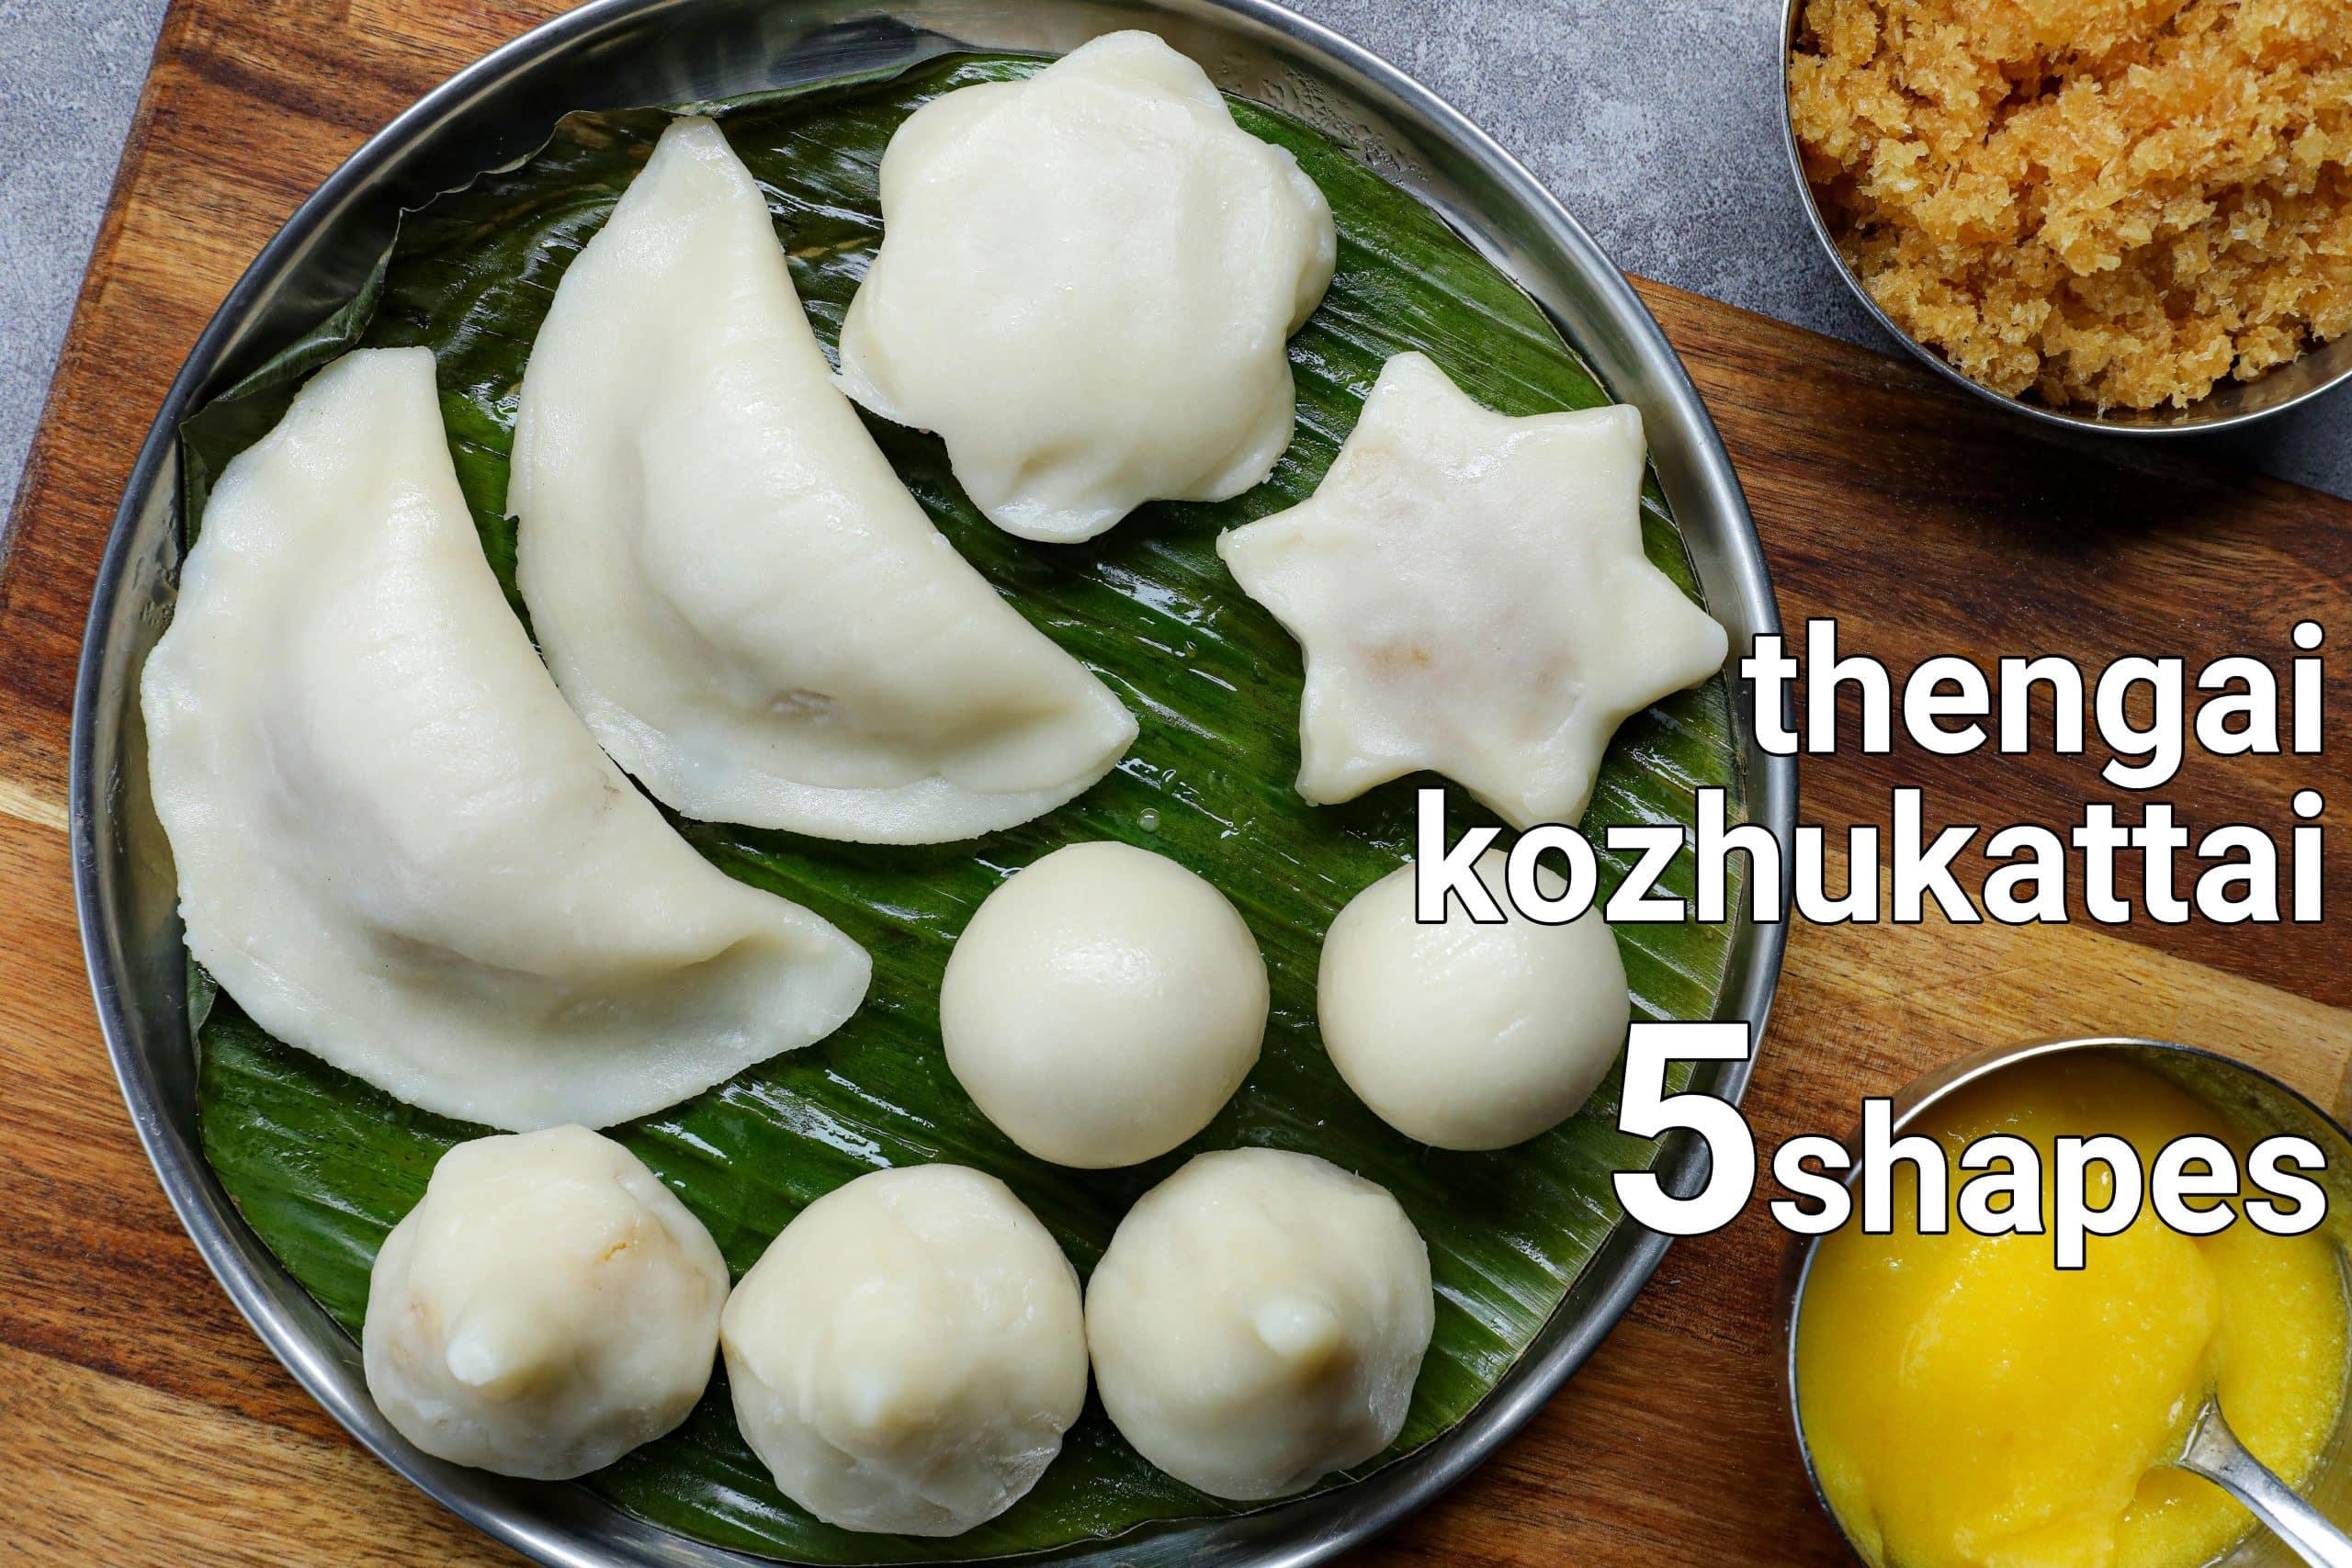 kozhukattai recipe | kolukattai recipe | thengai poorna kozhukattai